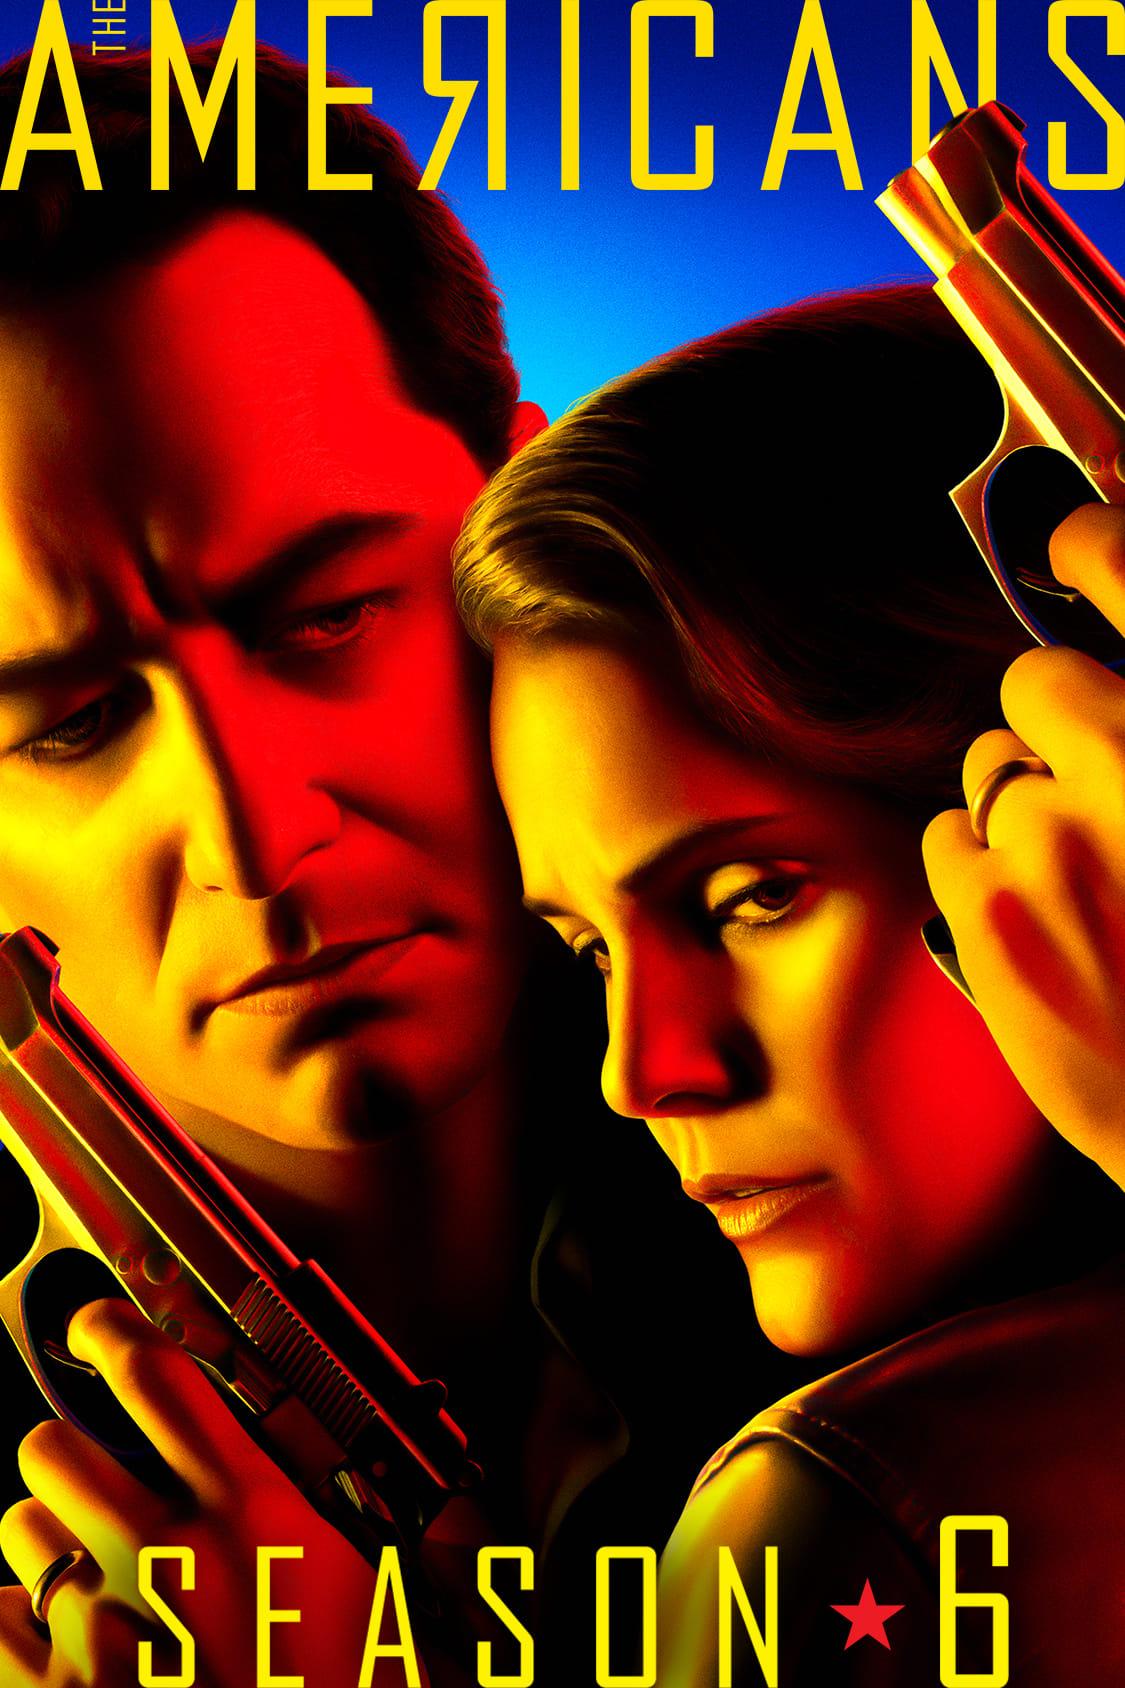 The Americans Season 6